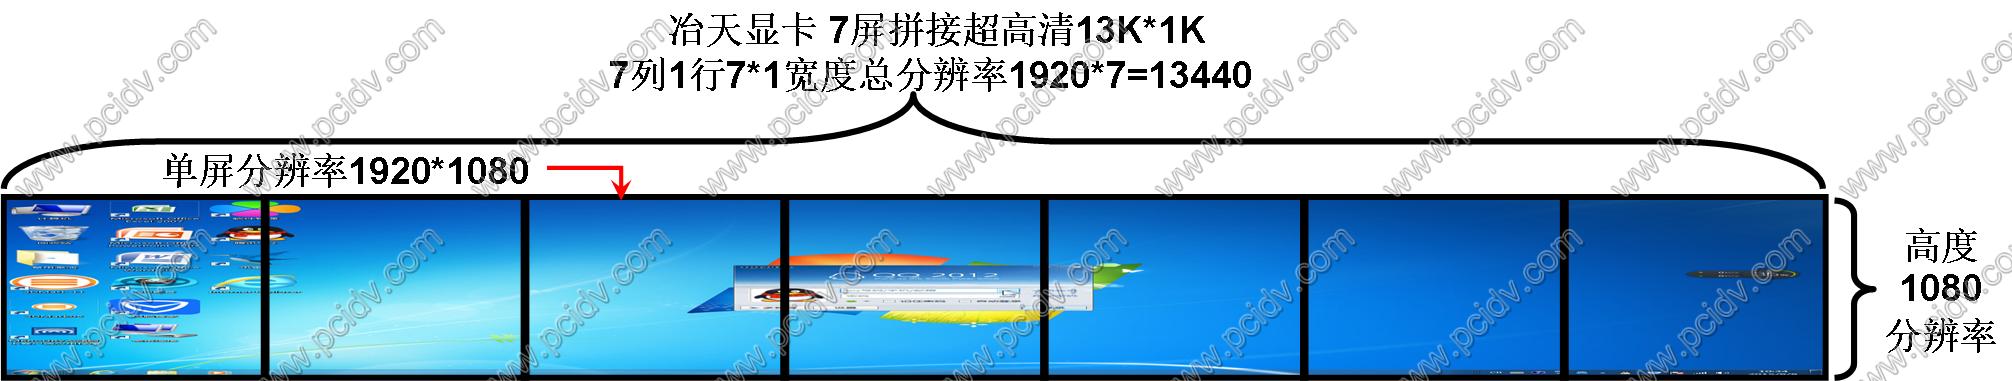 pcidv.com/AMD冶天显卡一机7屏拼接多屏显示墙单屏1920*1080